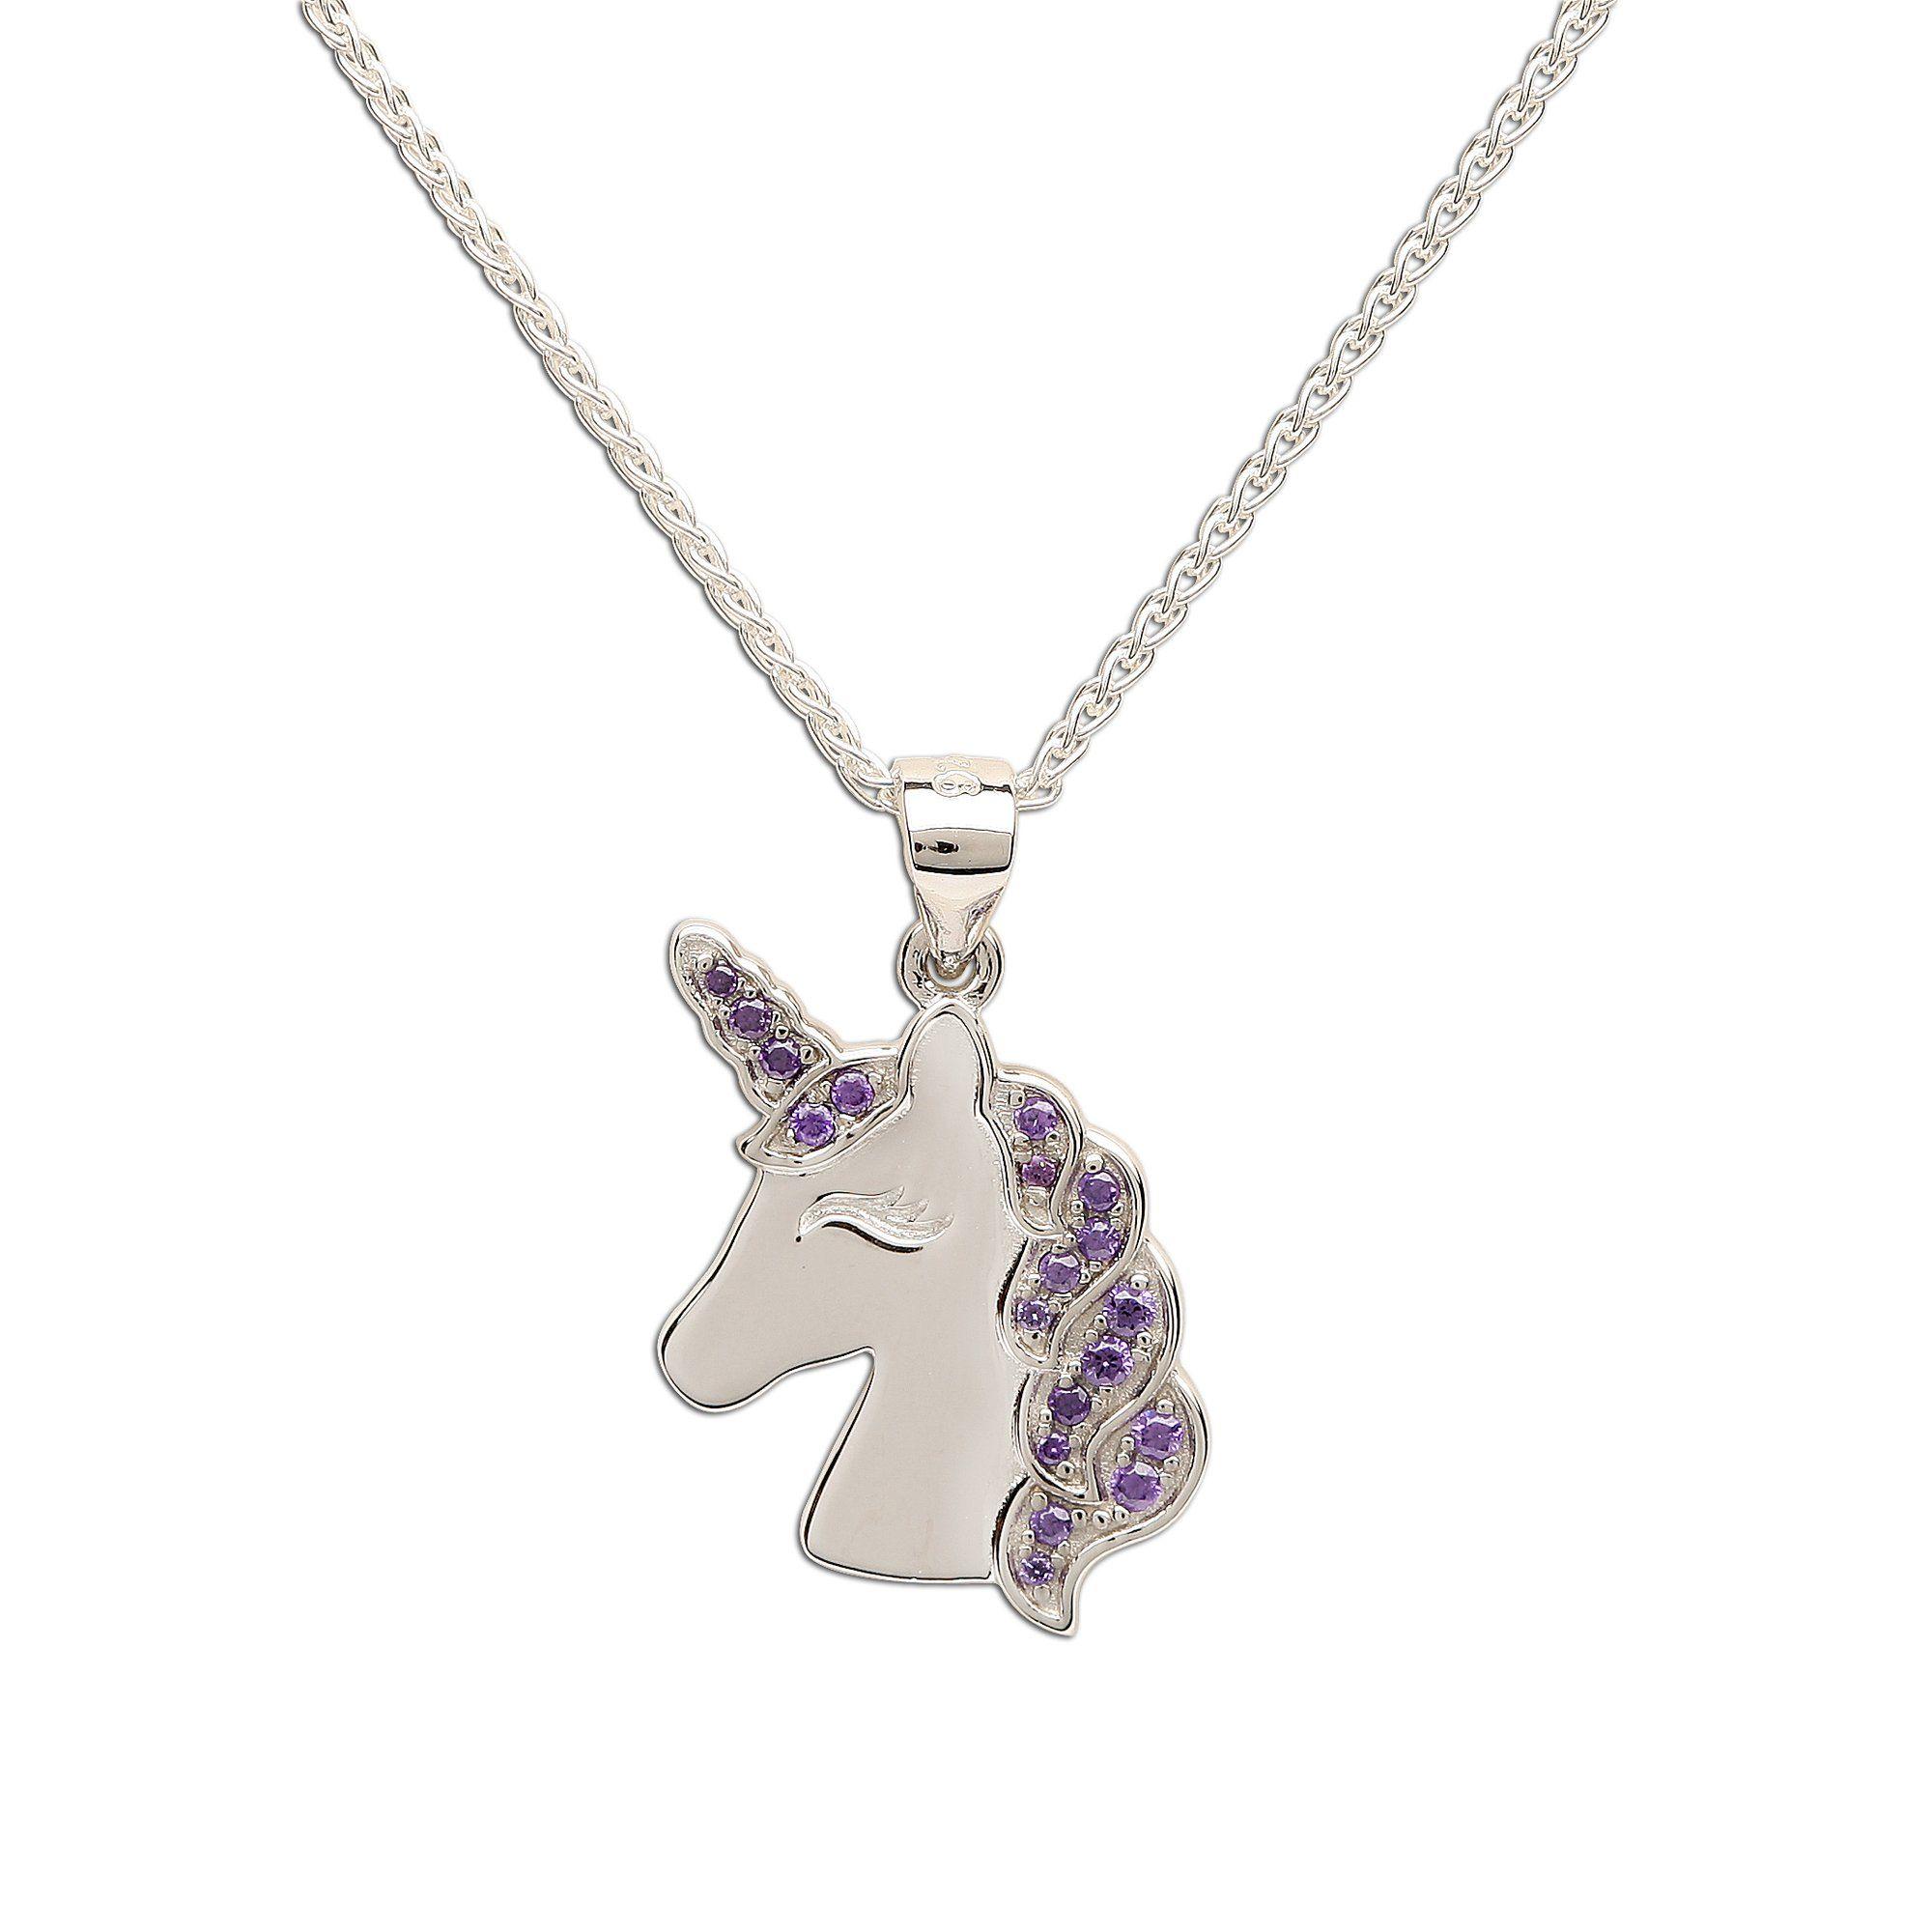 Sterling Silver Unicorn Necklace   FashionJunkie4Life